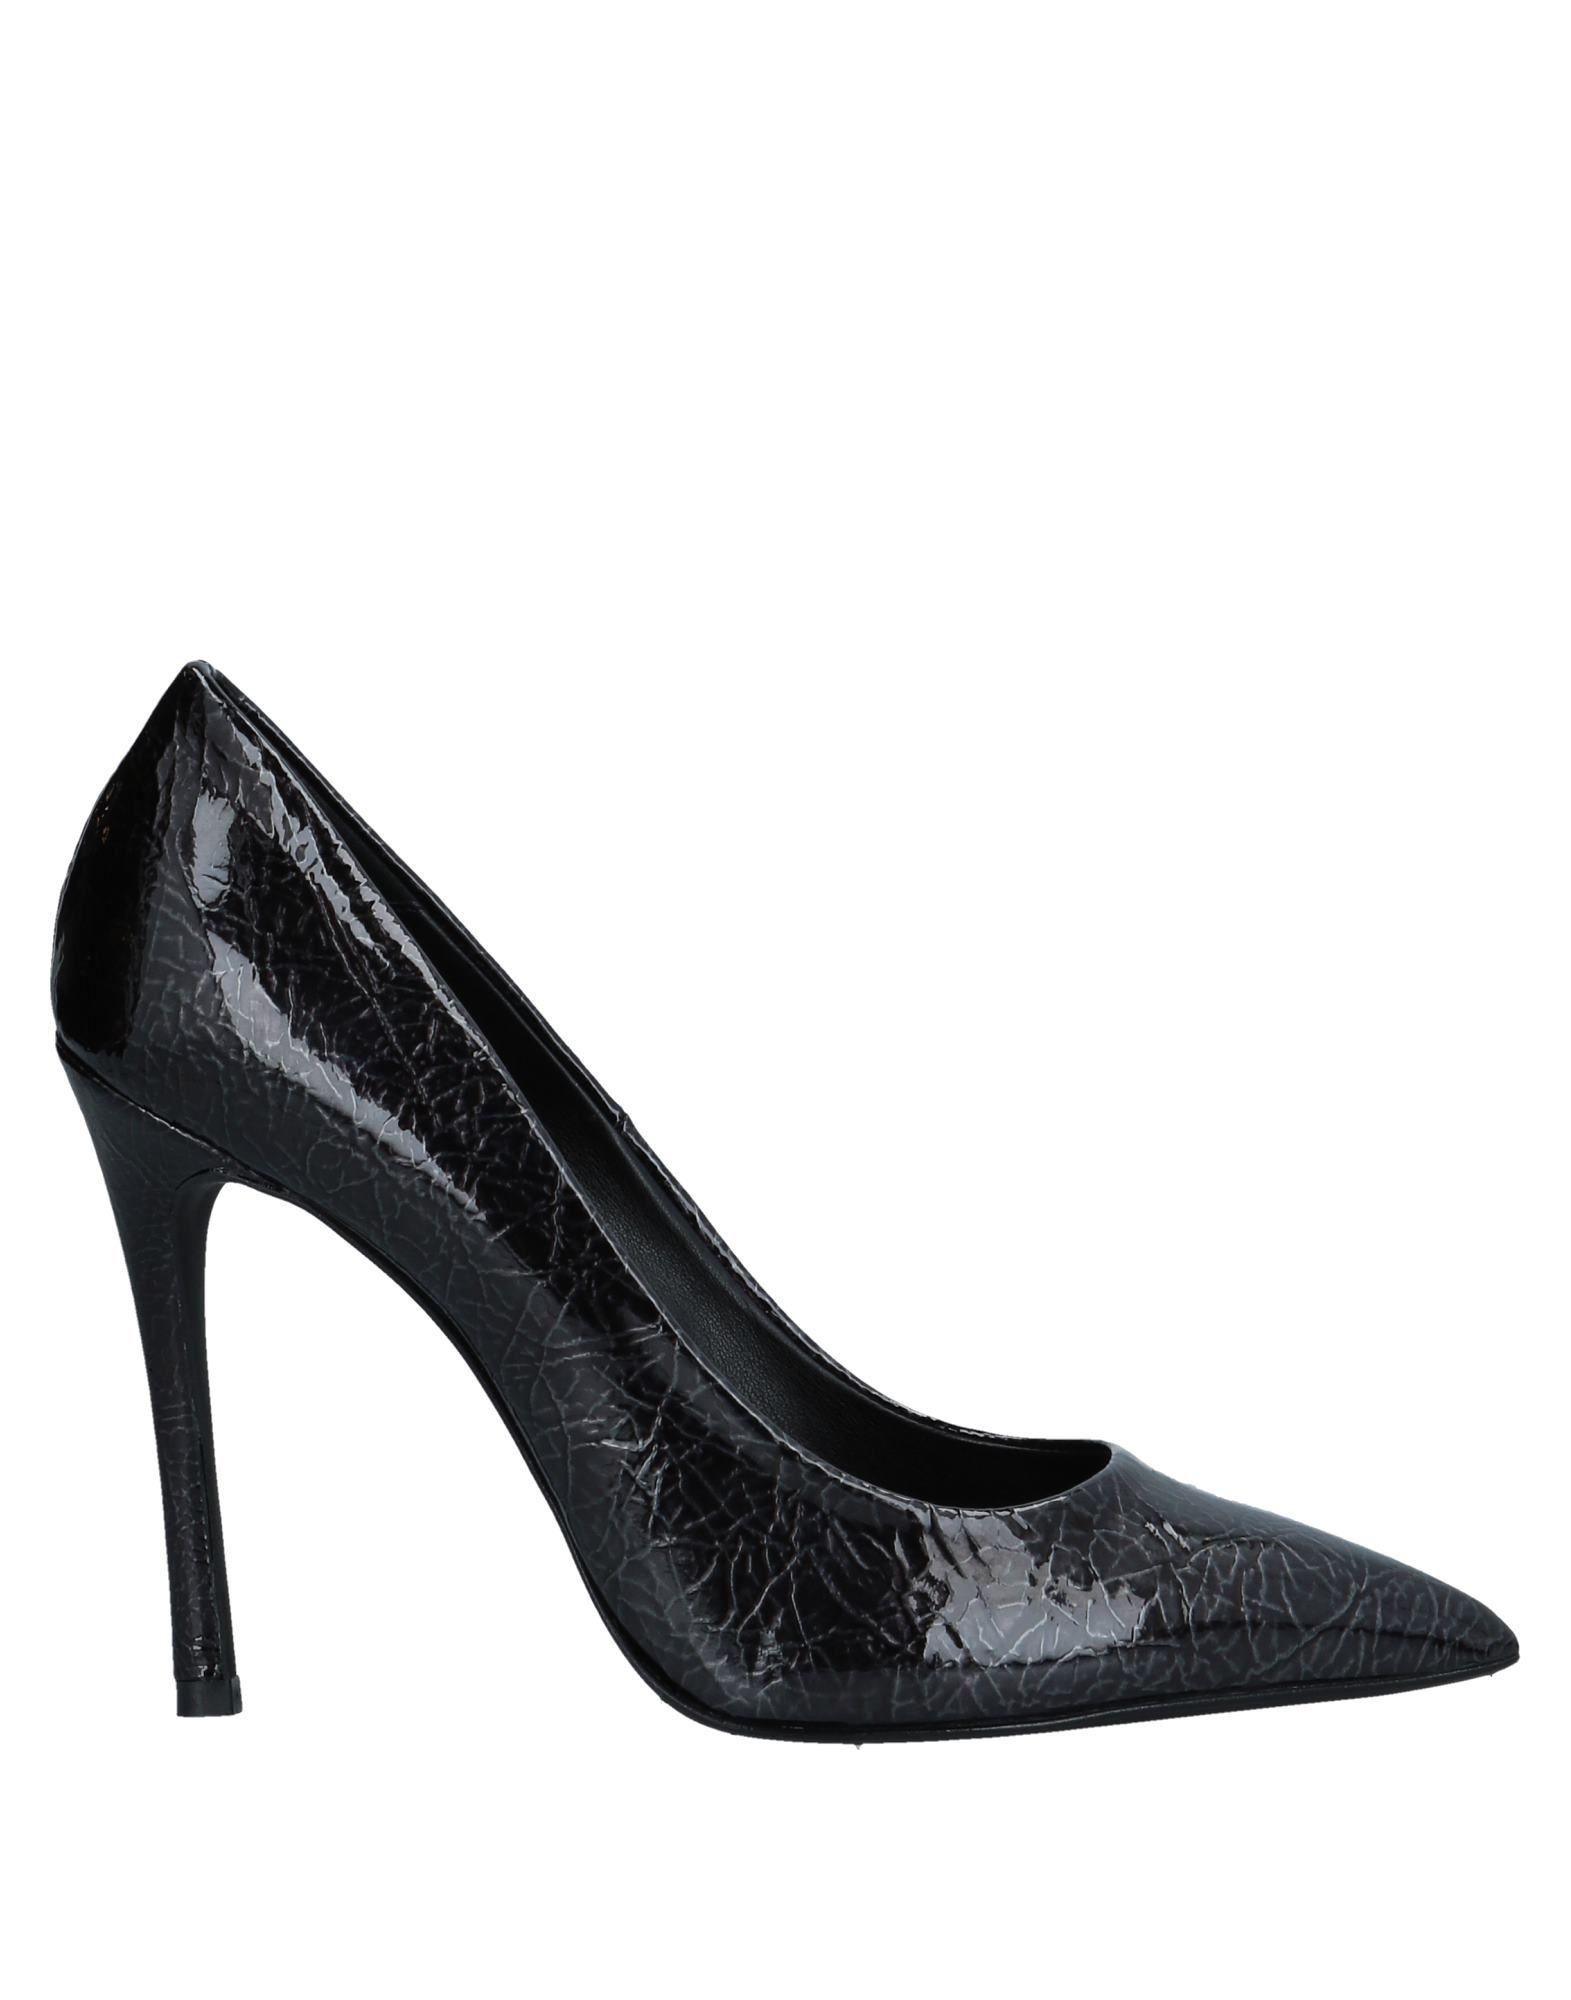 Ovye' By Cristina Lucchi Pumps Damen  Schuhe 11532871FL Gute Qualität beliebte Schuhe  cf4087